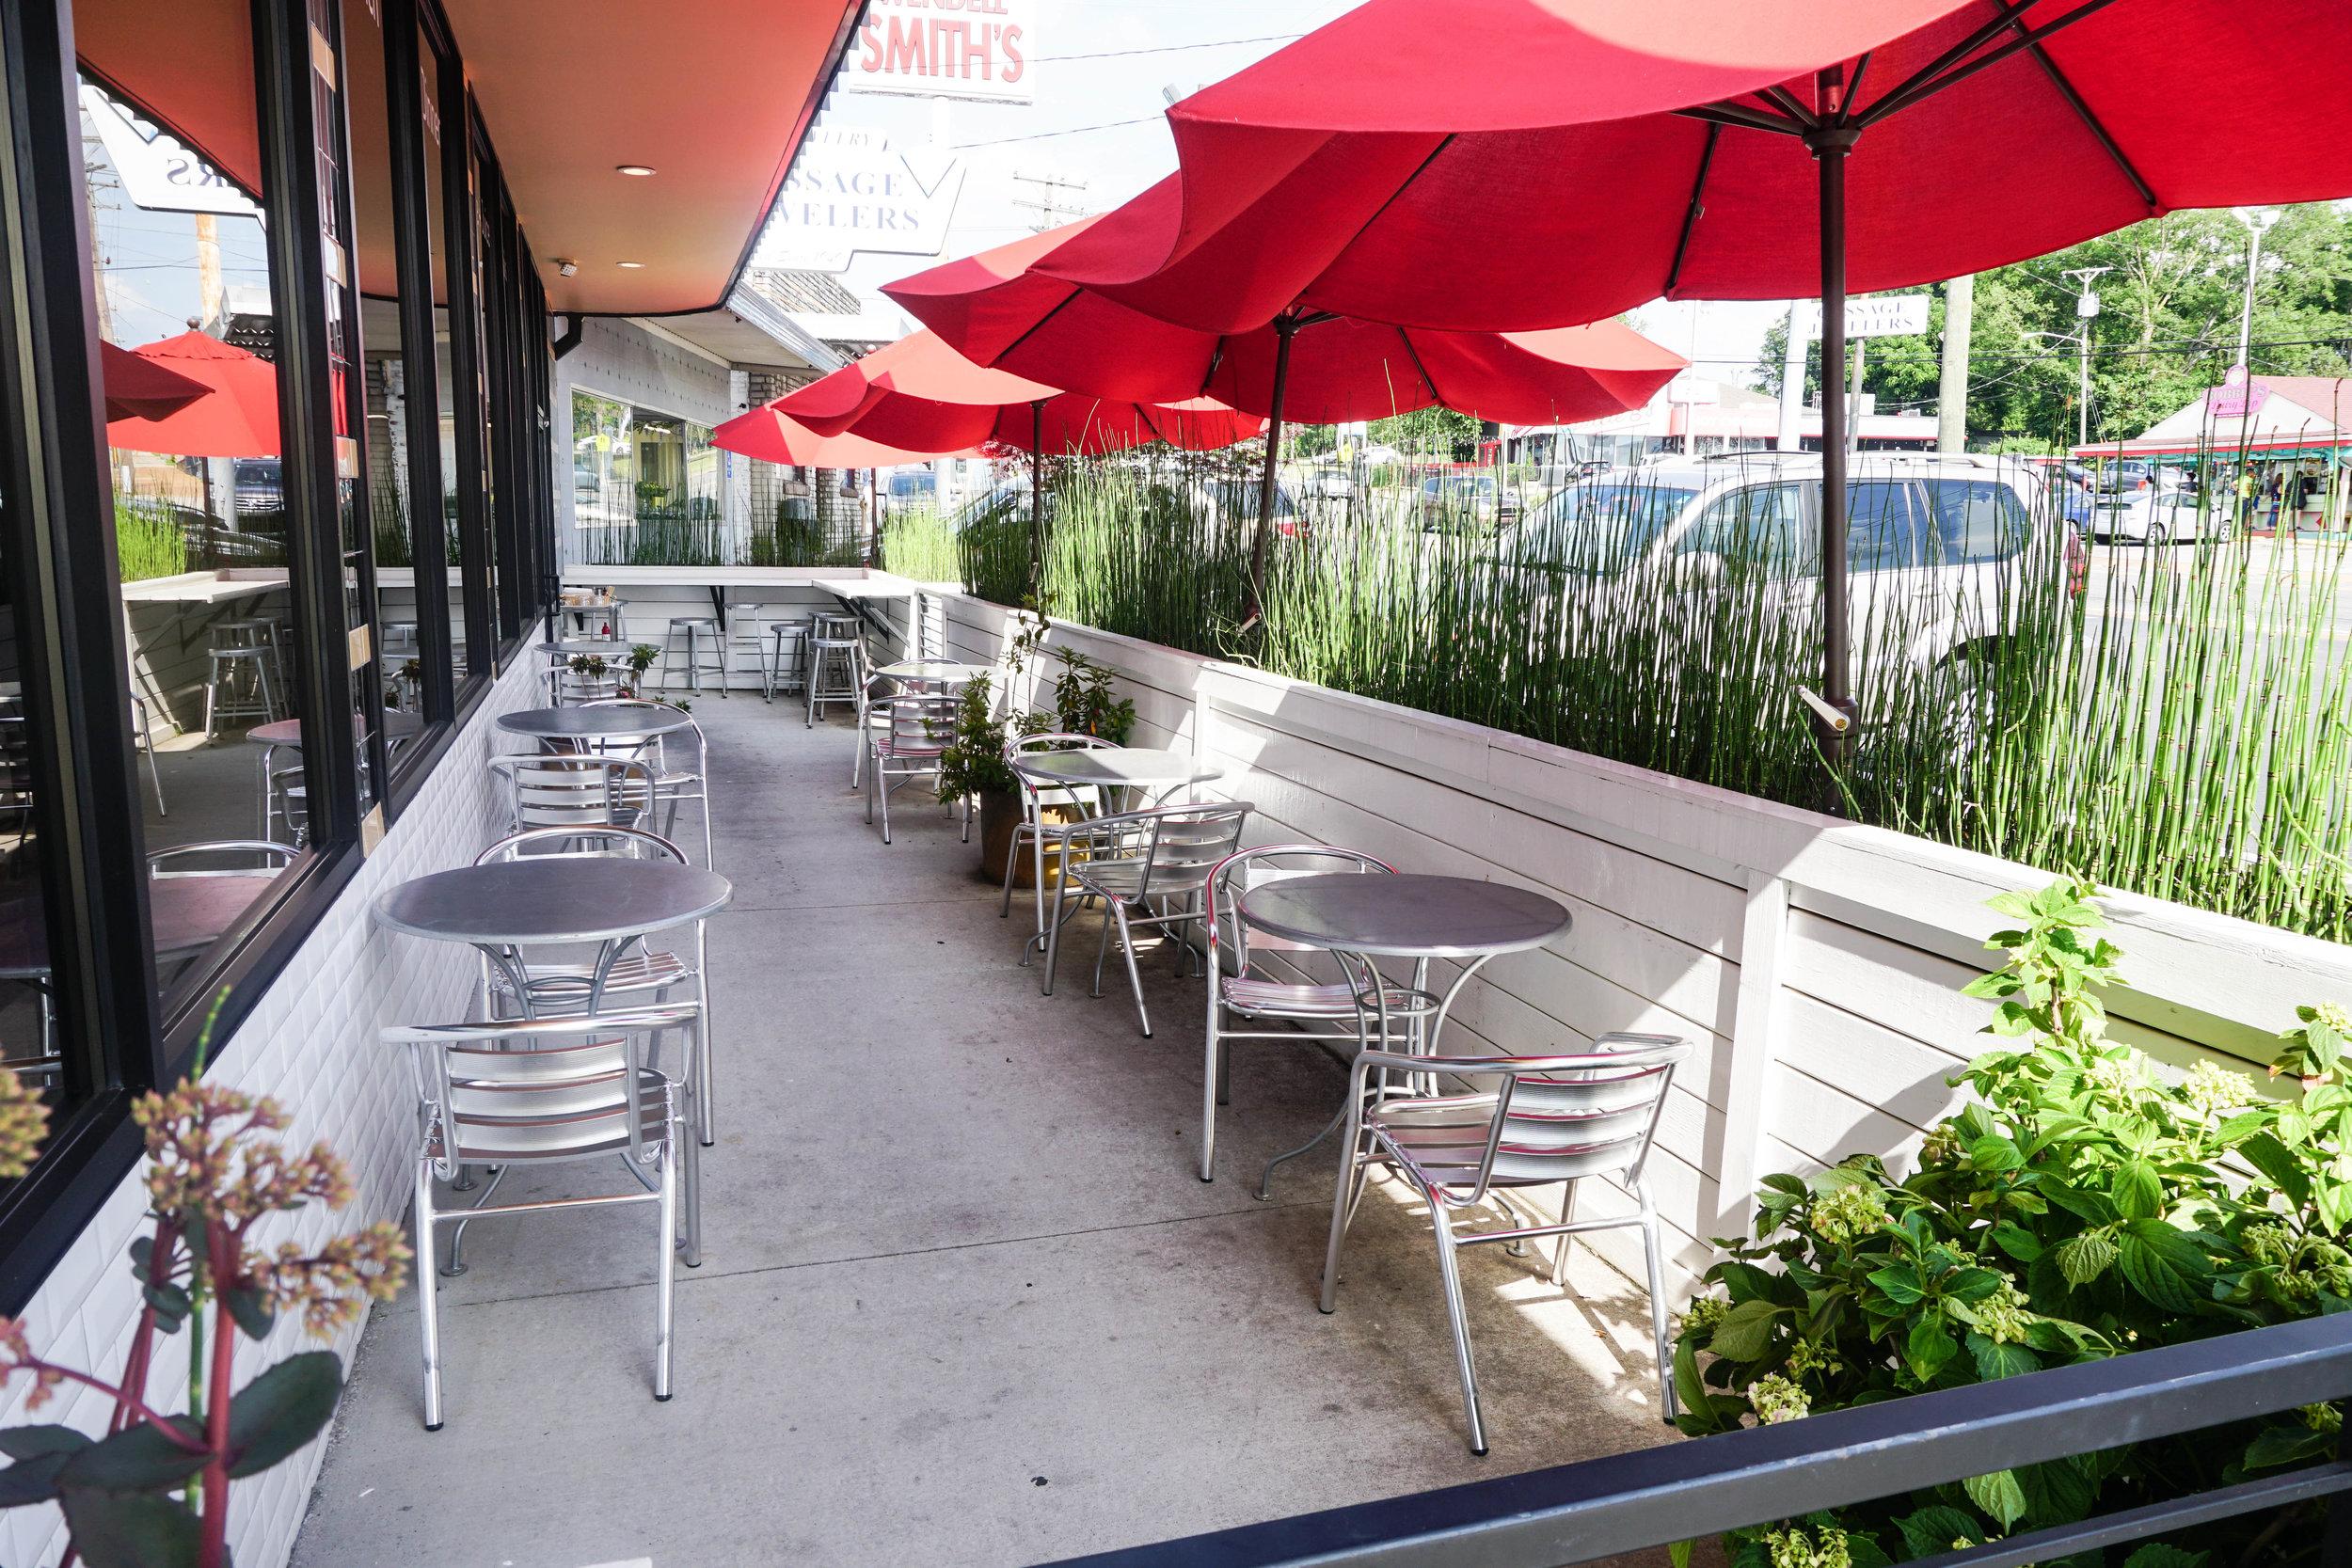 restaurant-patio-nashville-eio-and-the-hive-where-to-eat-nash-organic.jpg